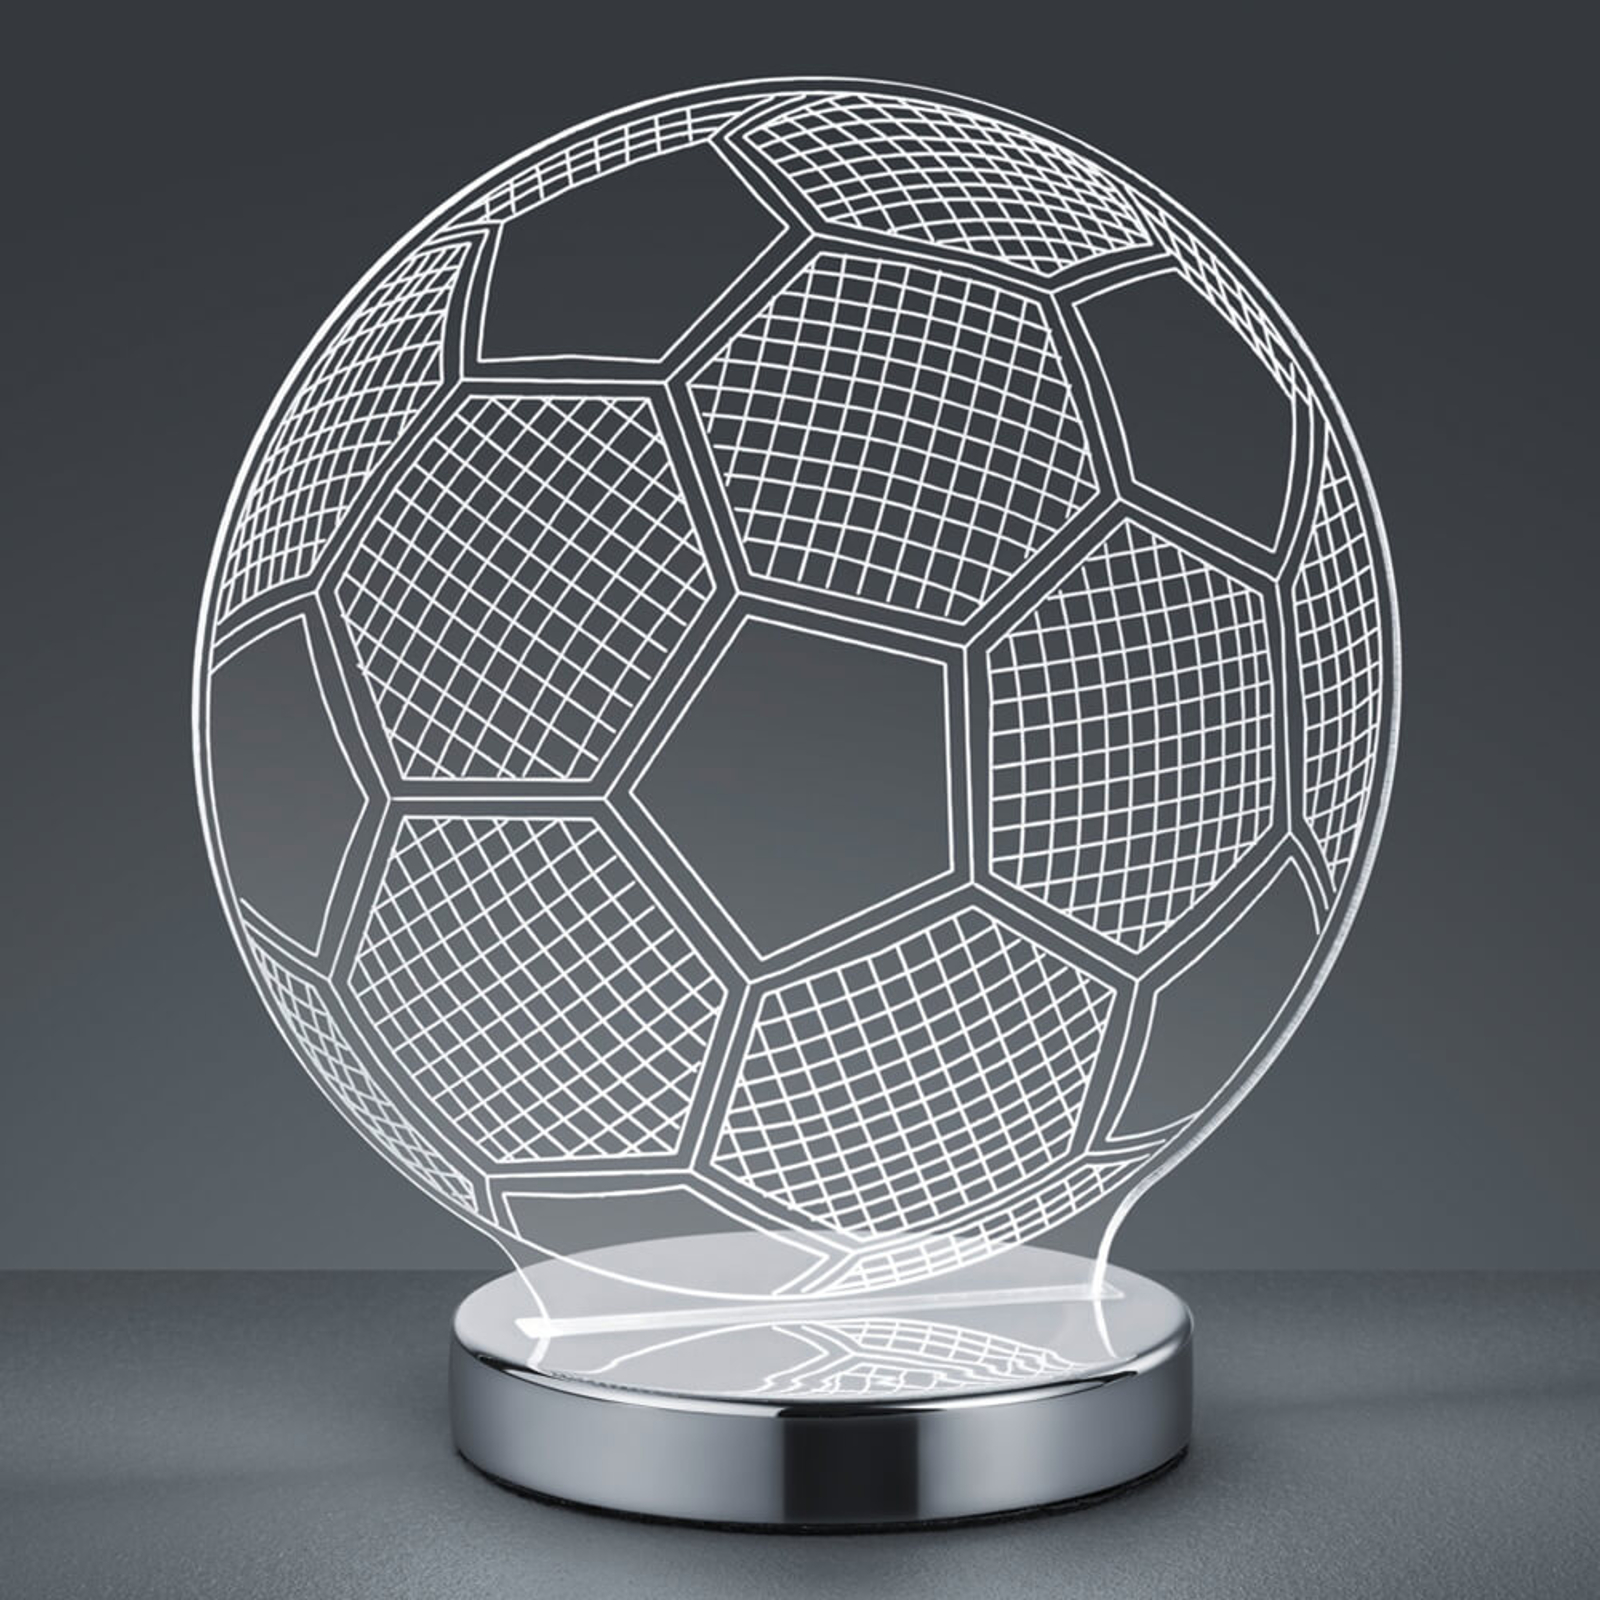 3D-hologrambordslampa Ball - valbar ljustemperatur